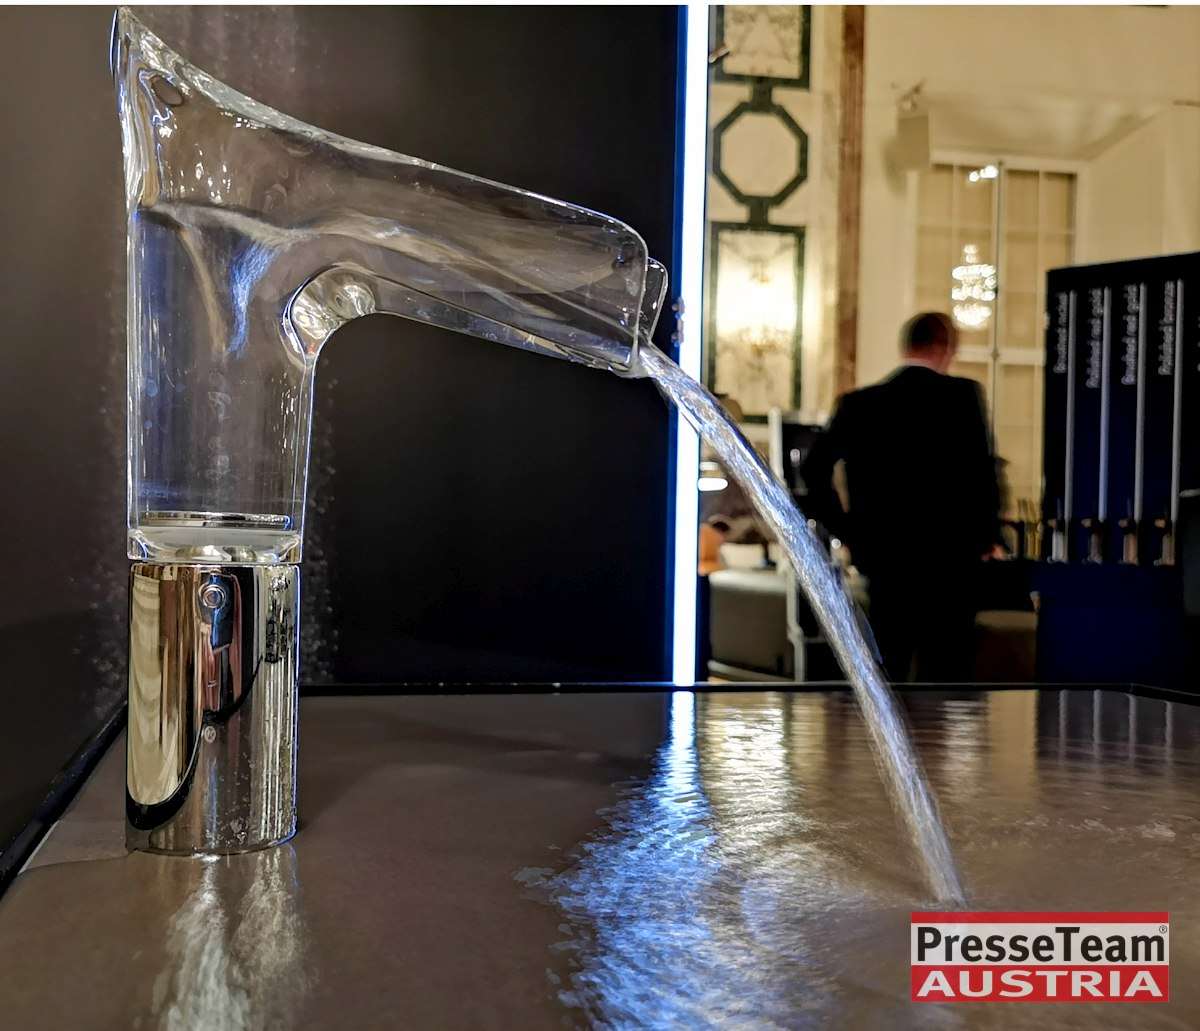 Messe Hofburg Wien 67 - Luxus Möbelmesse & Lifestyle in der Hofburg Wien